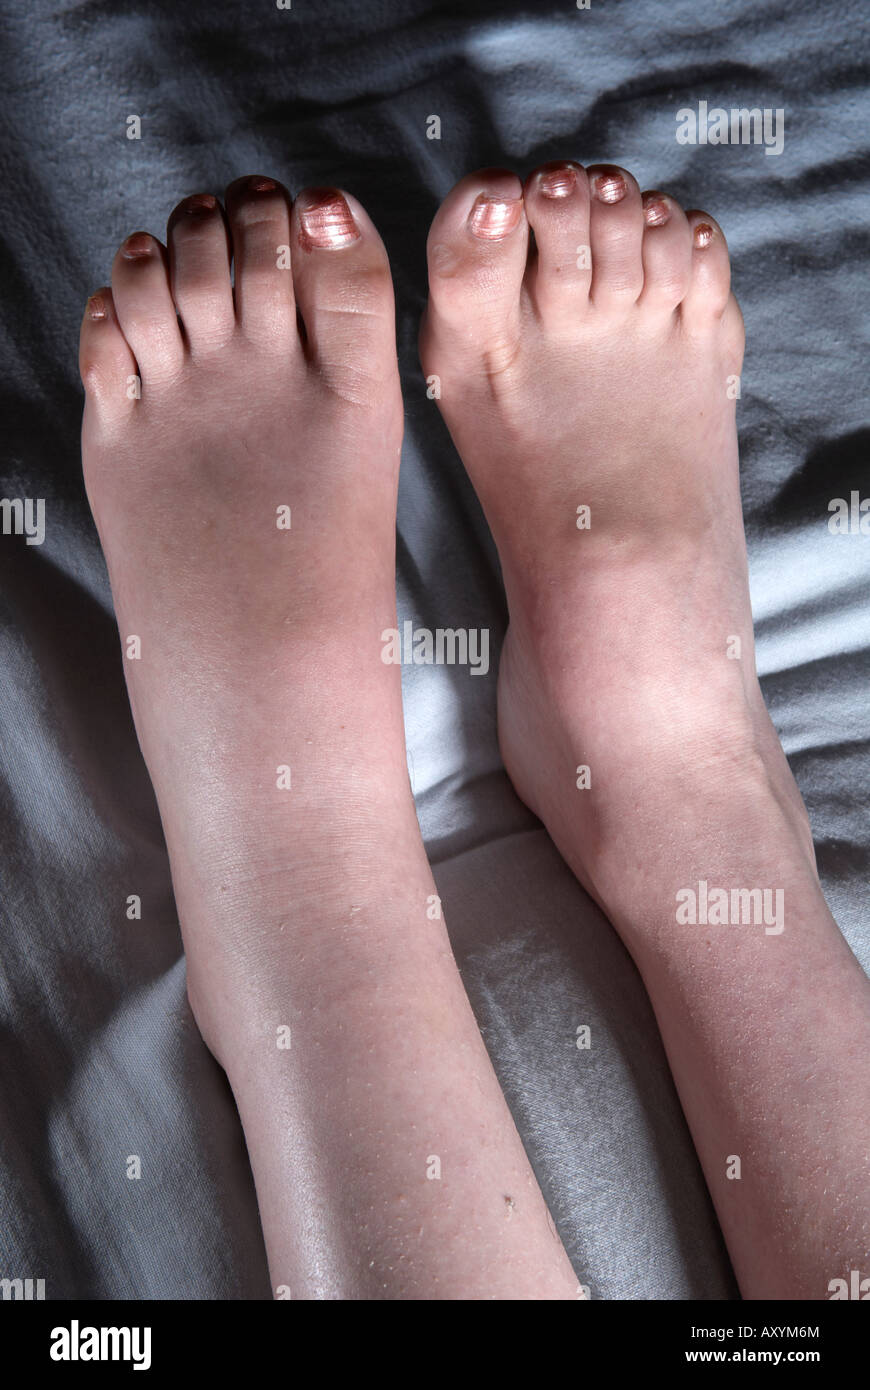 Mature women toes